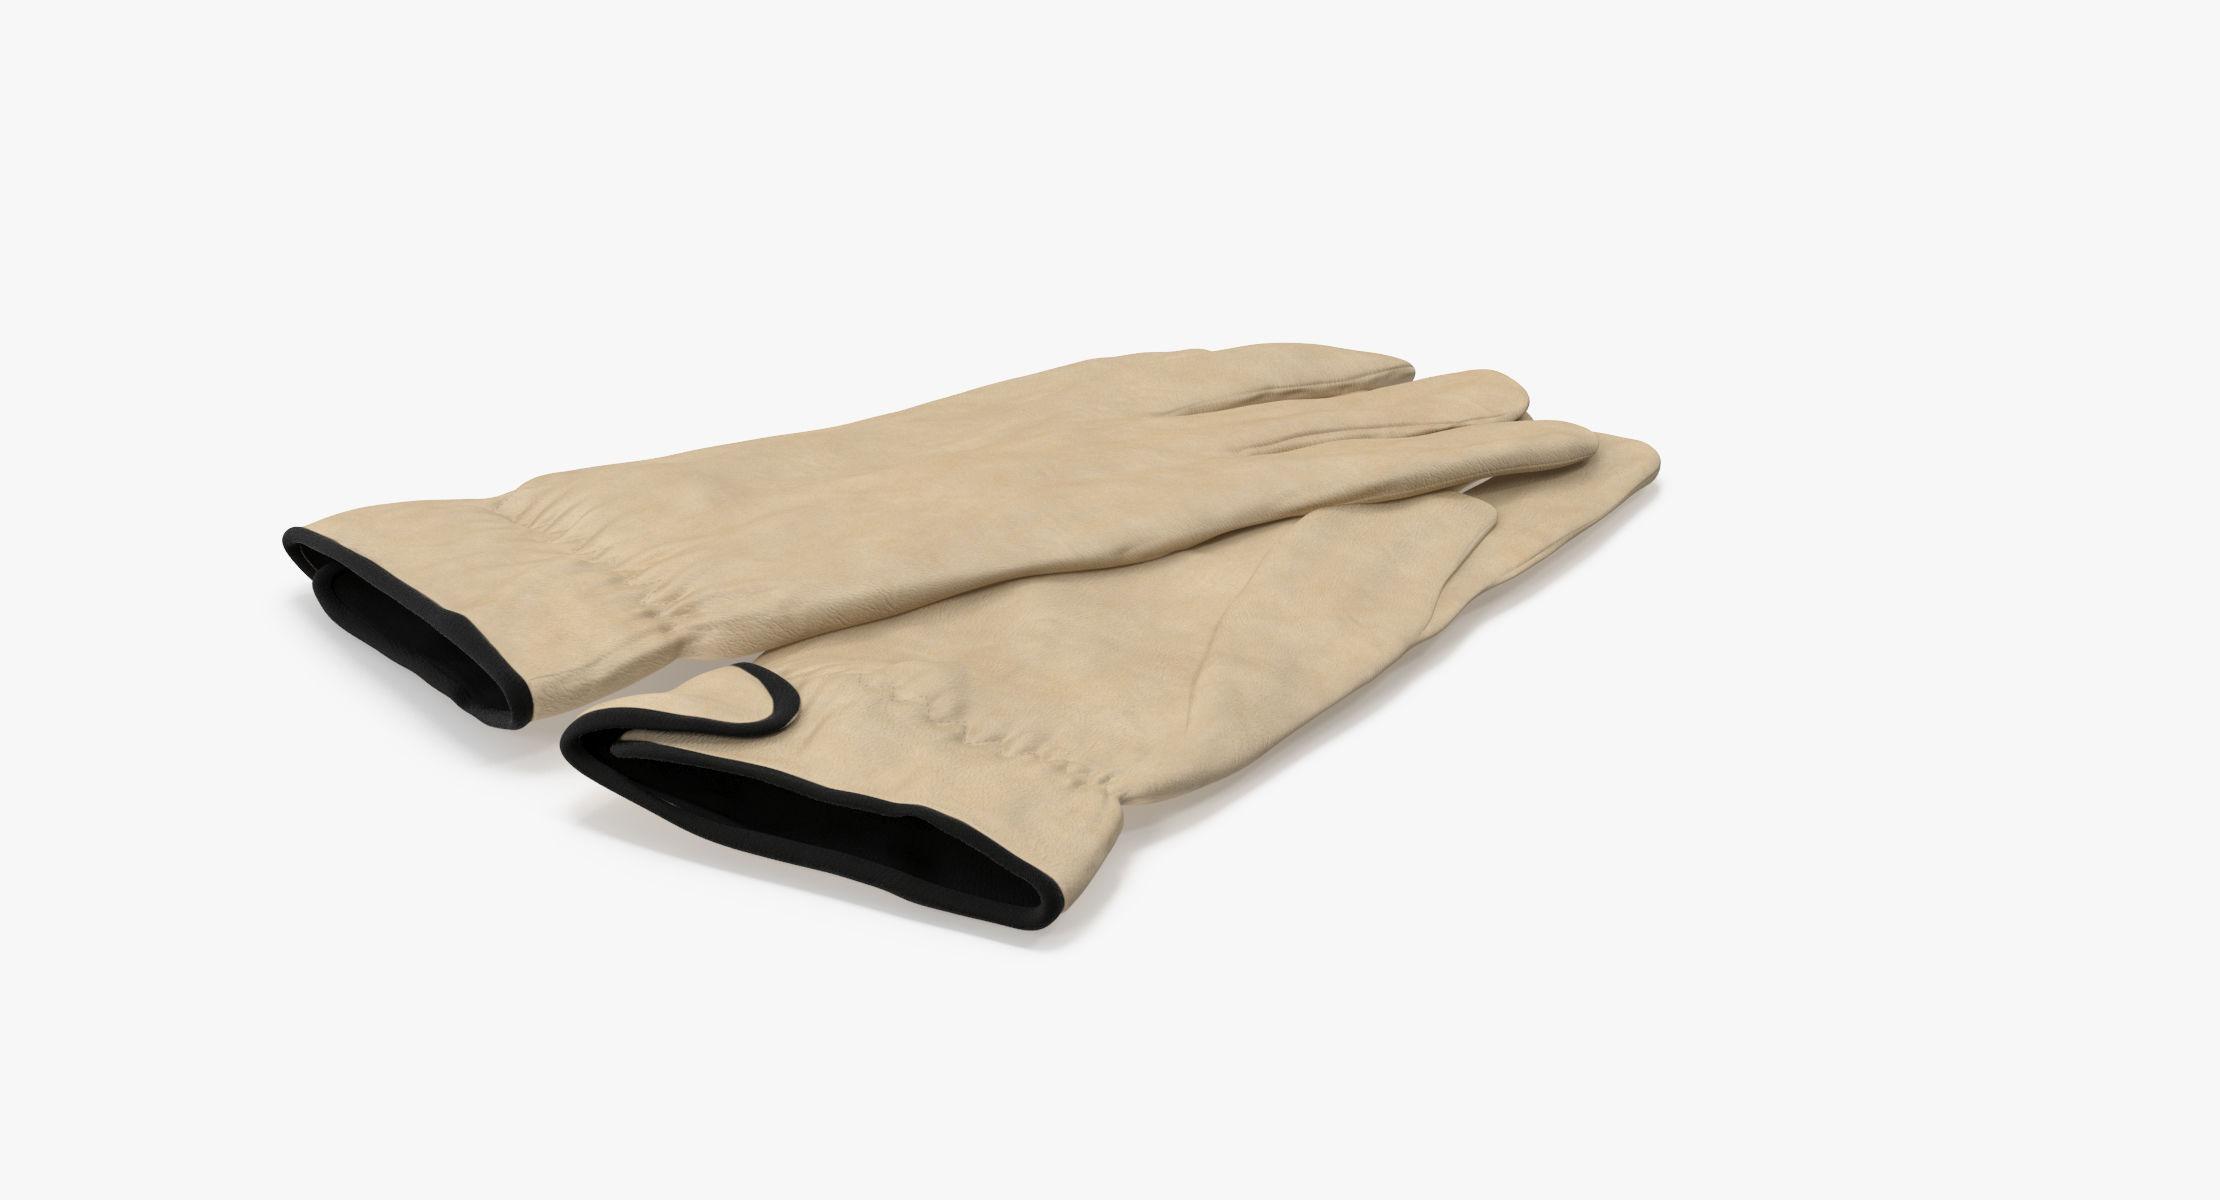 Leather Work Gloves 02 - reel 1